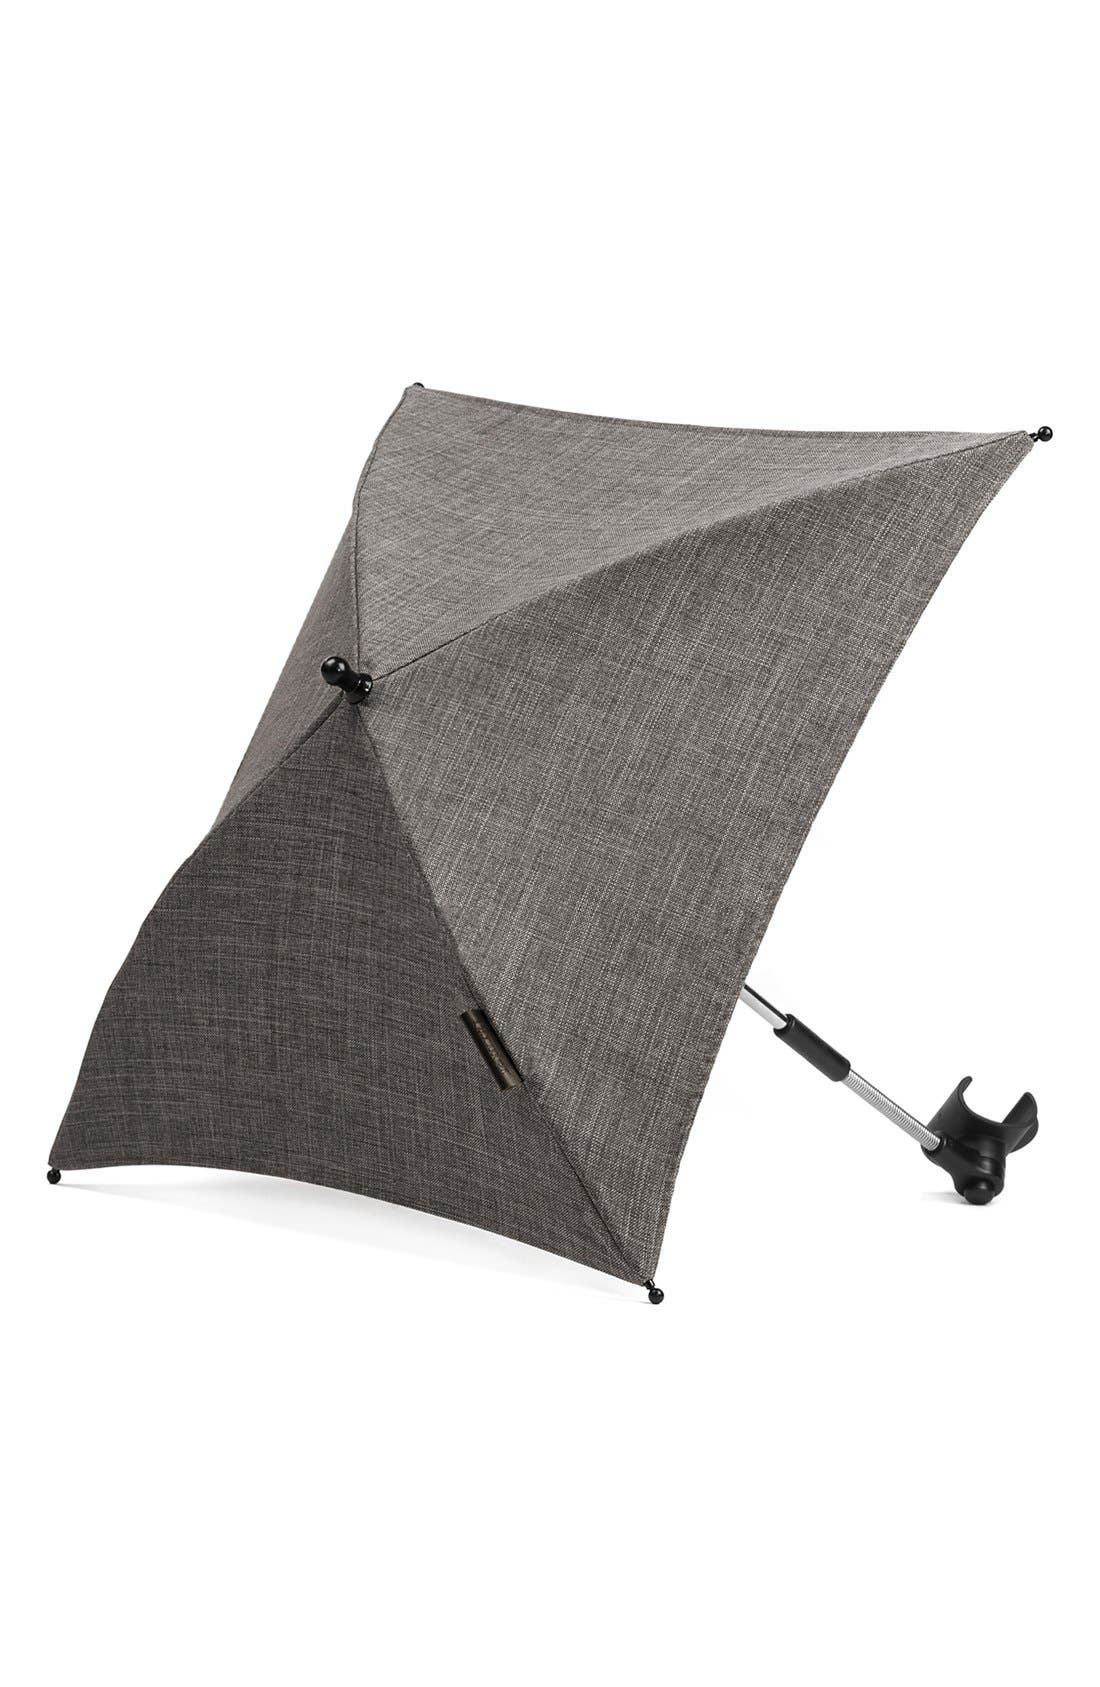 Main Image - Mutsy 'Igo - Farmer Earth' Stroller Umbrella